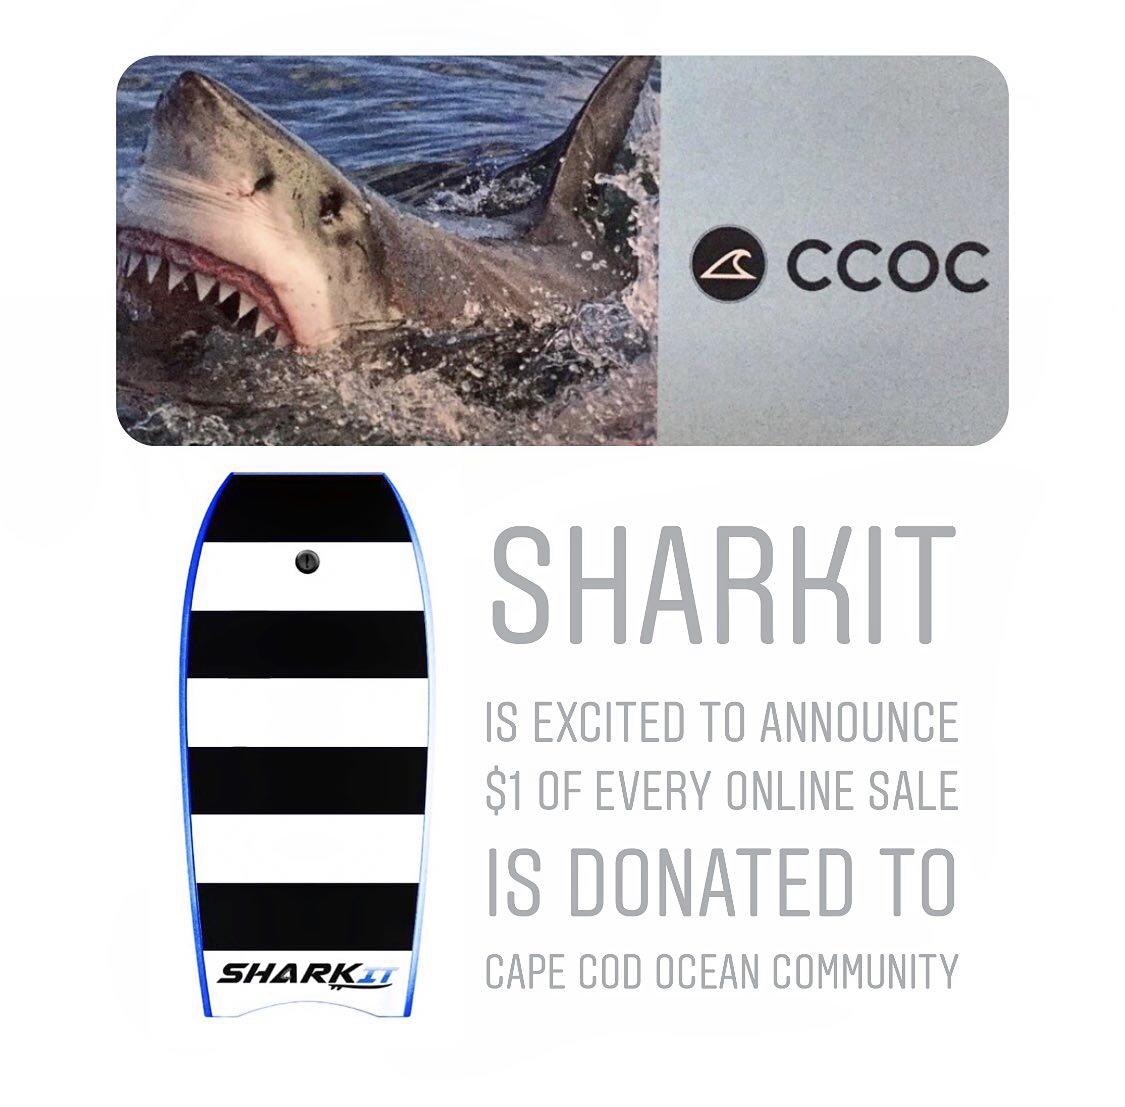 CCOC shark.jpg